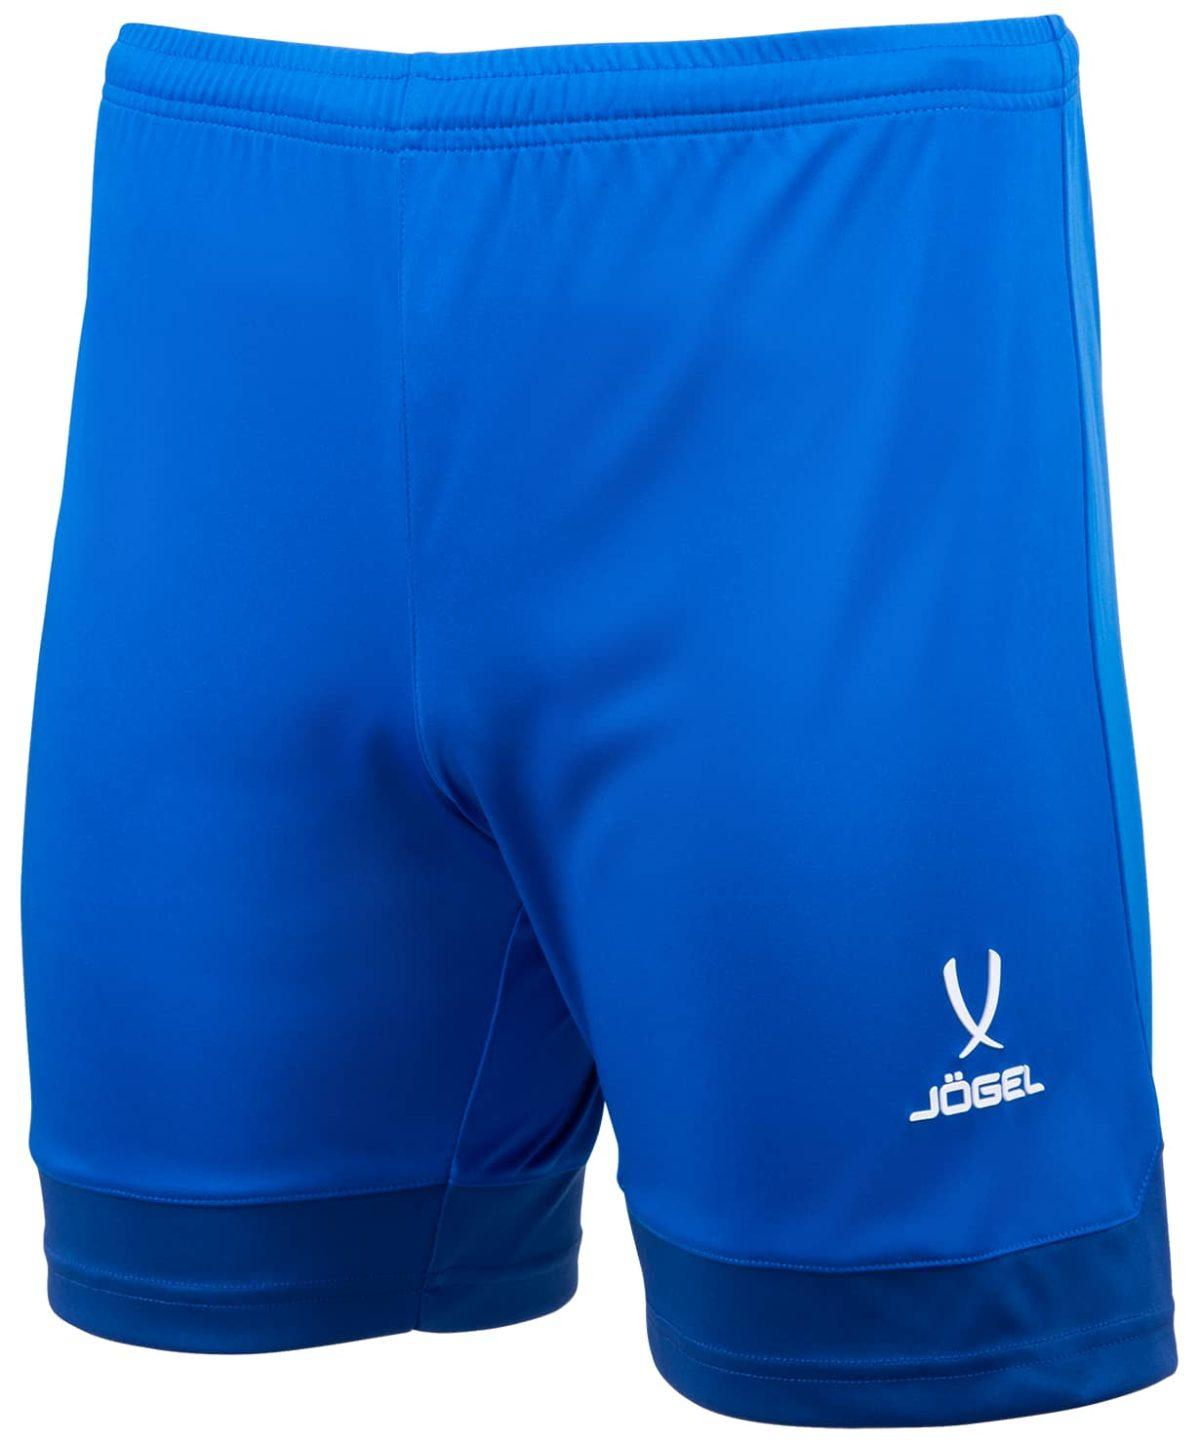 JOGEL DIVISION шорты футбольные  Union Shorts - 1